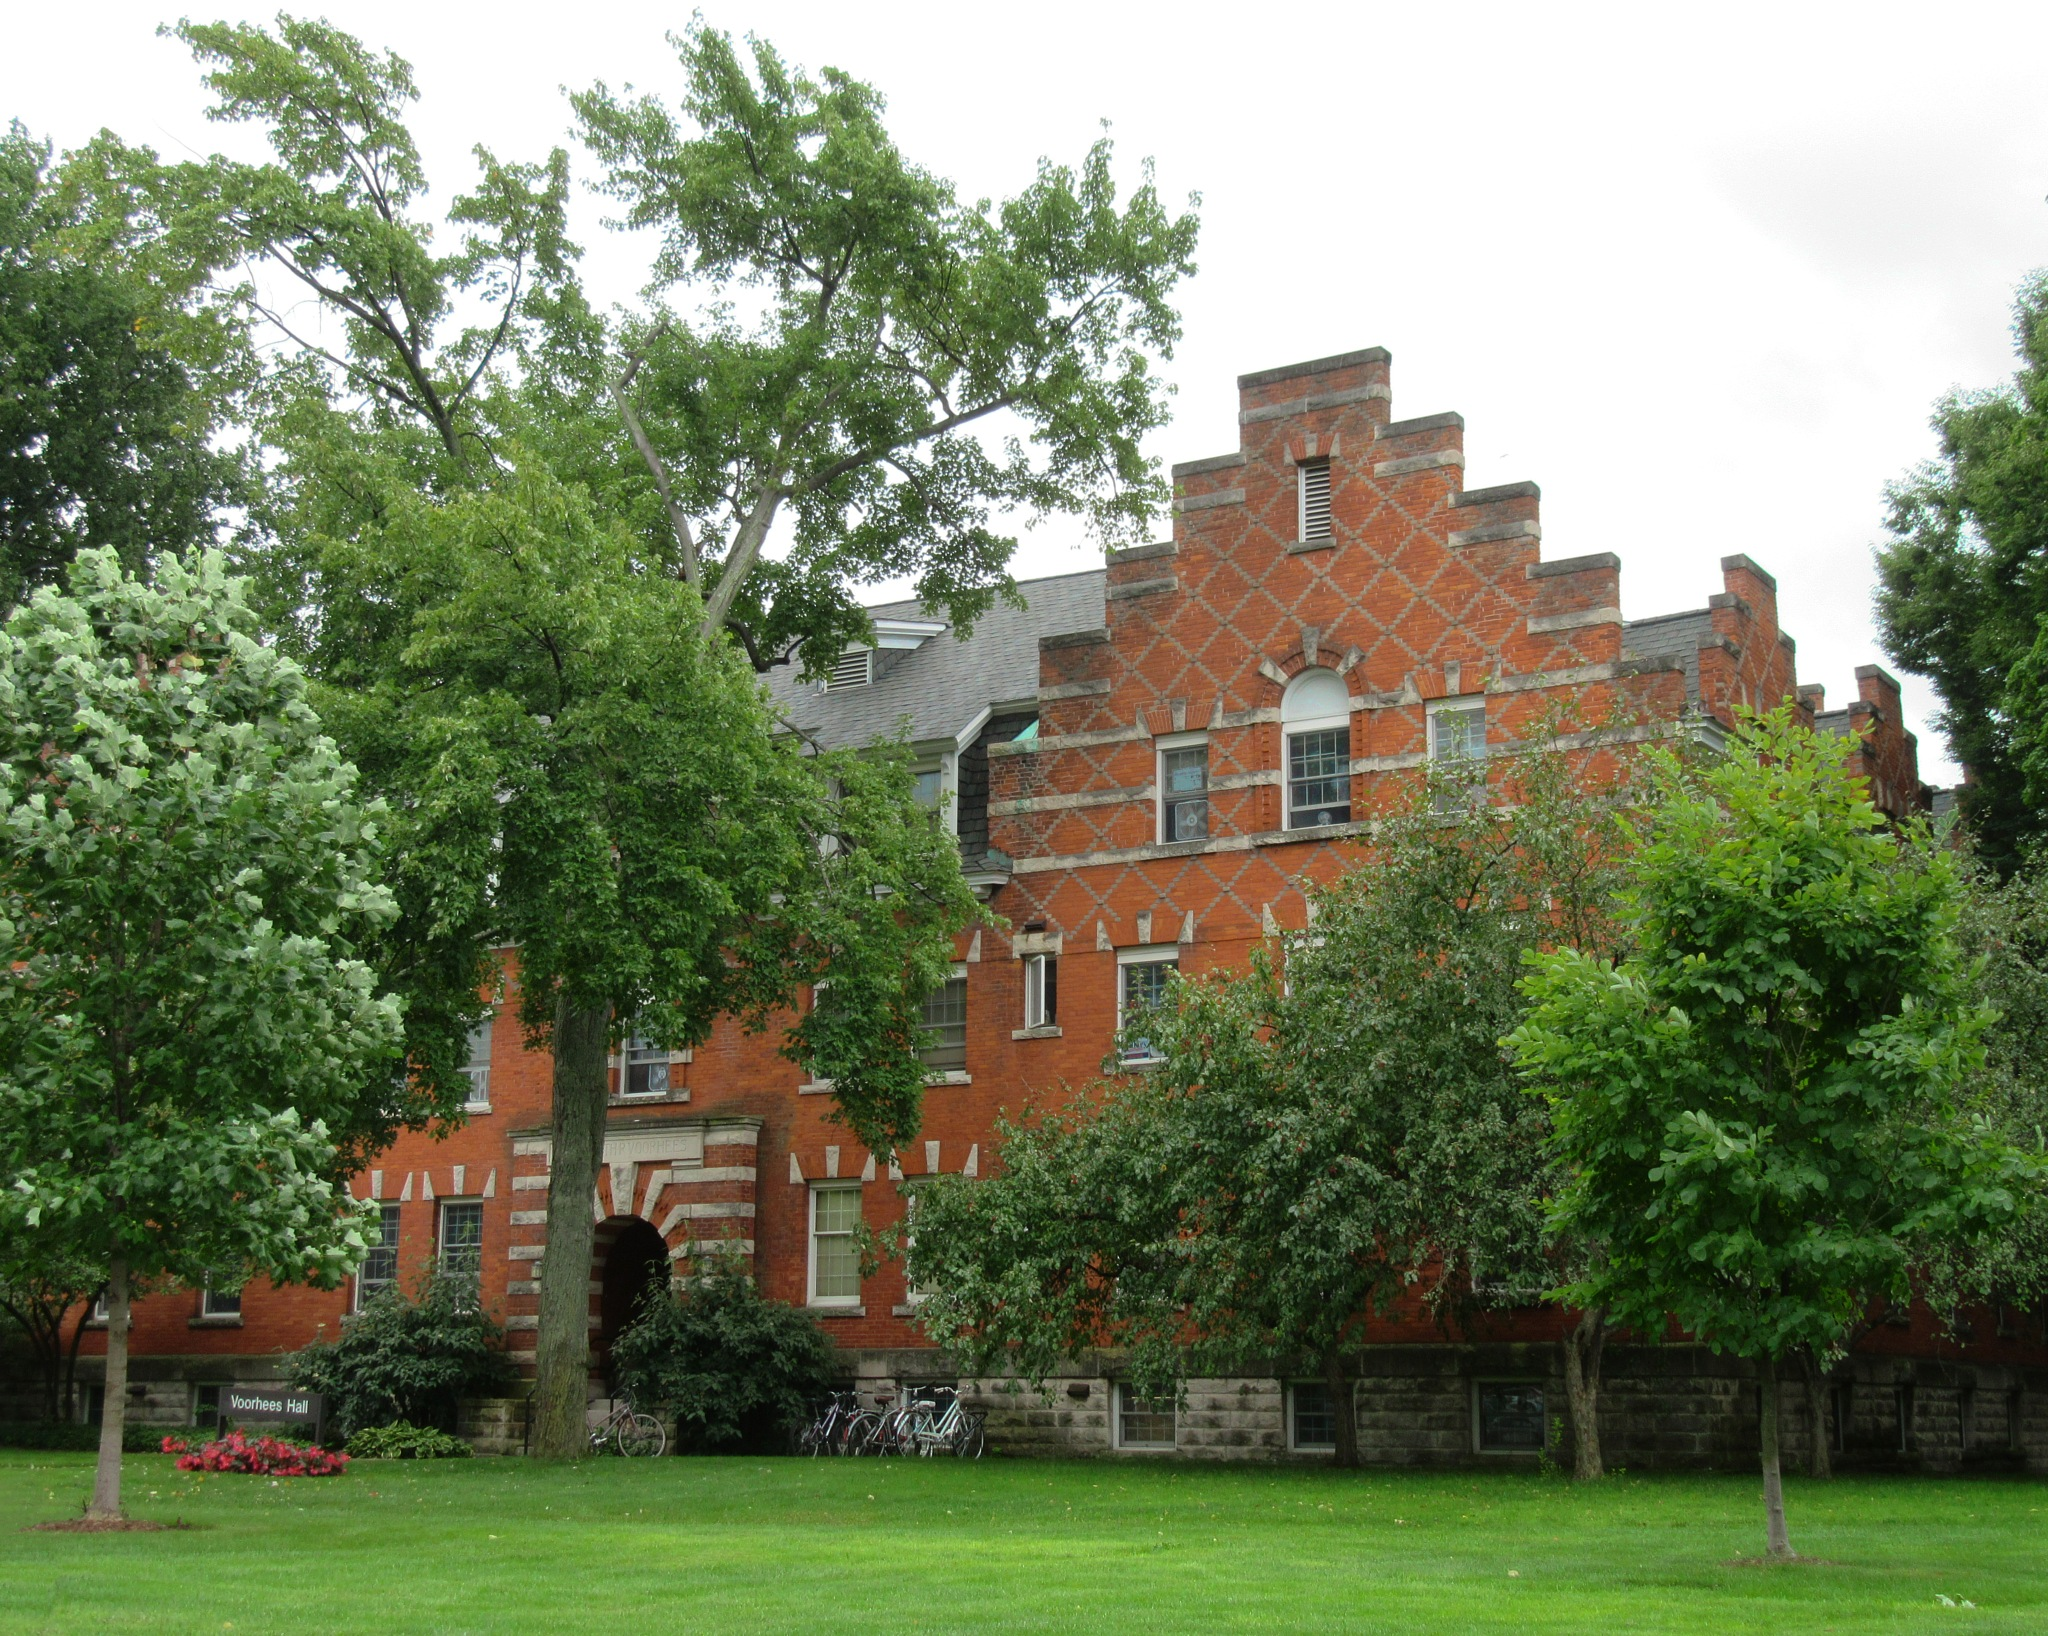 Voorhees Hall, Hope College by LizWilliamsOriginals